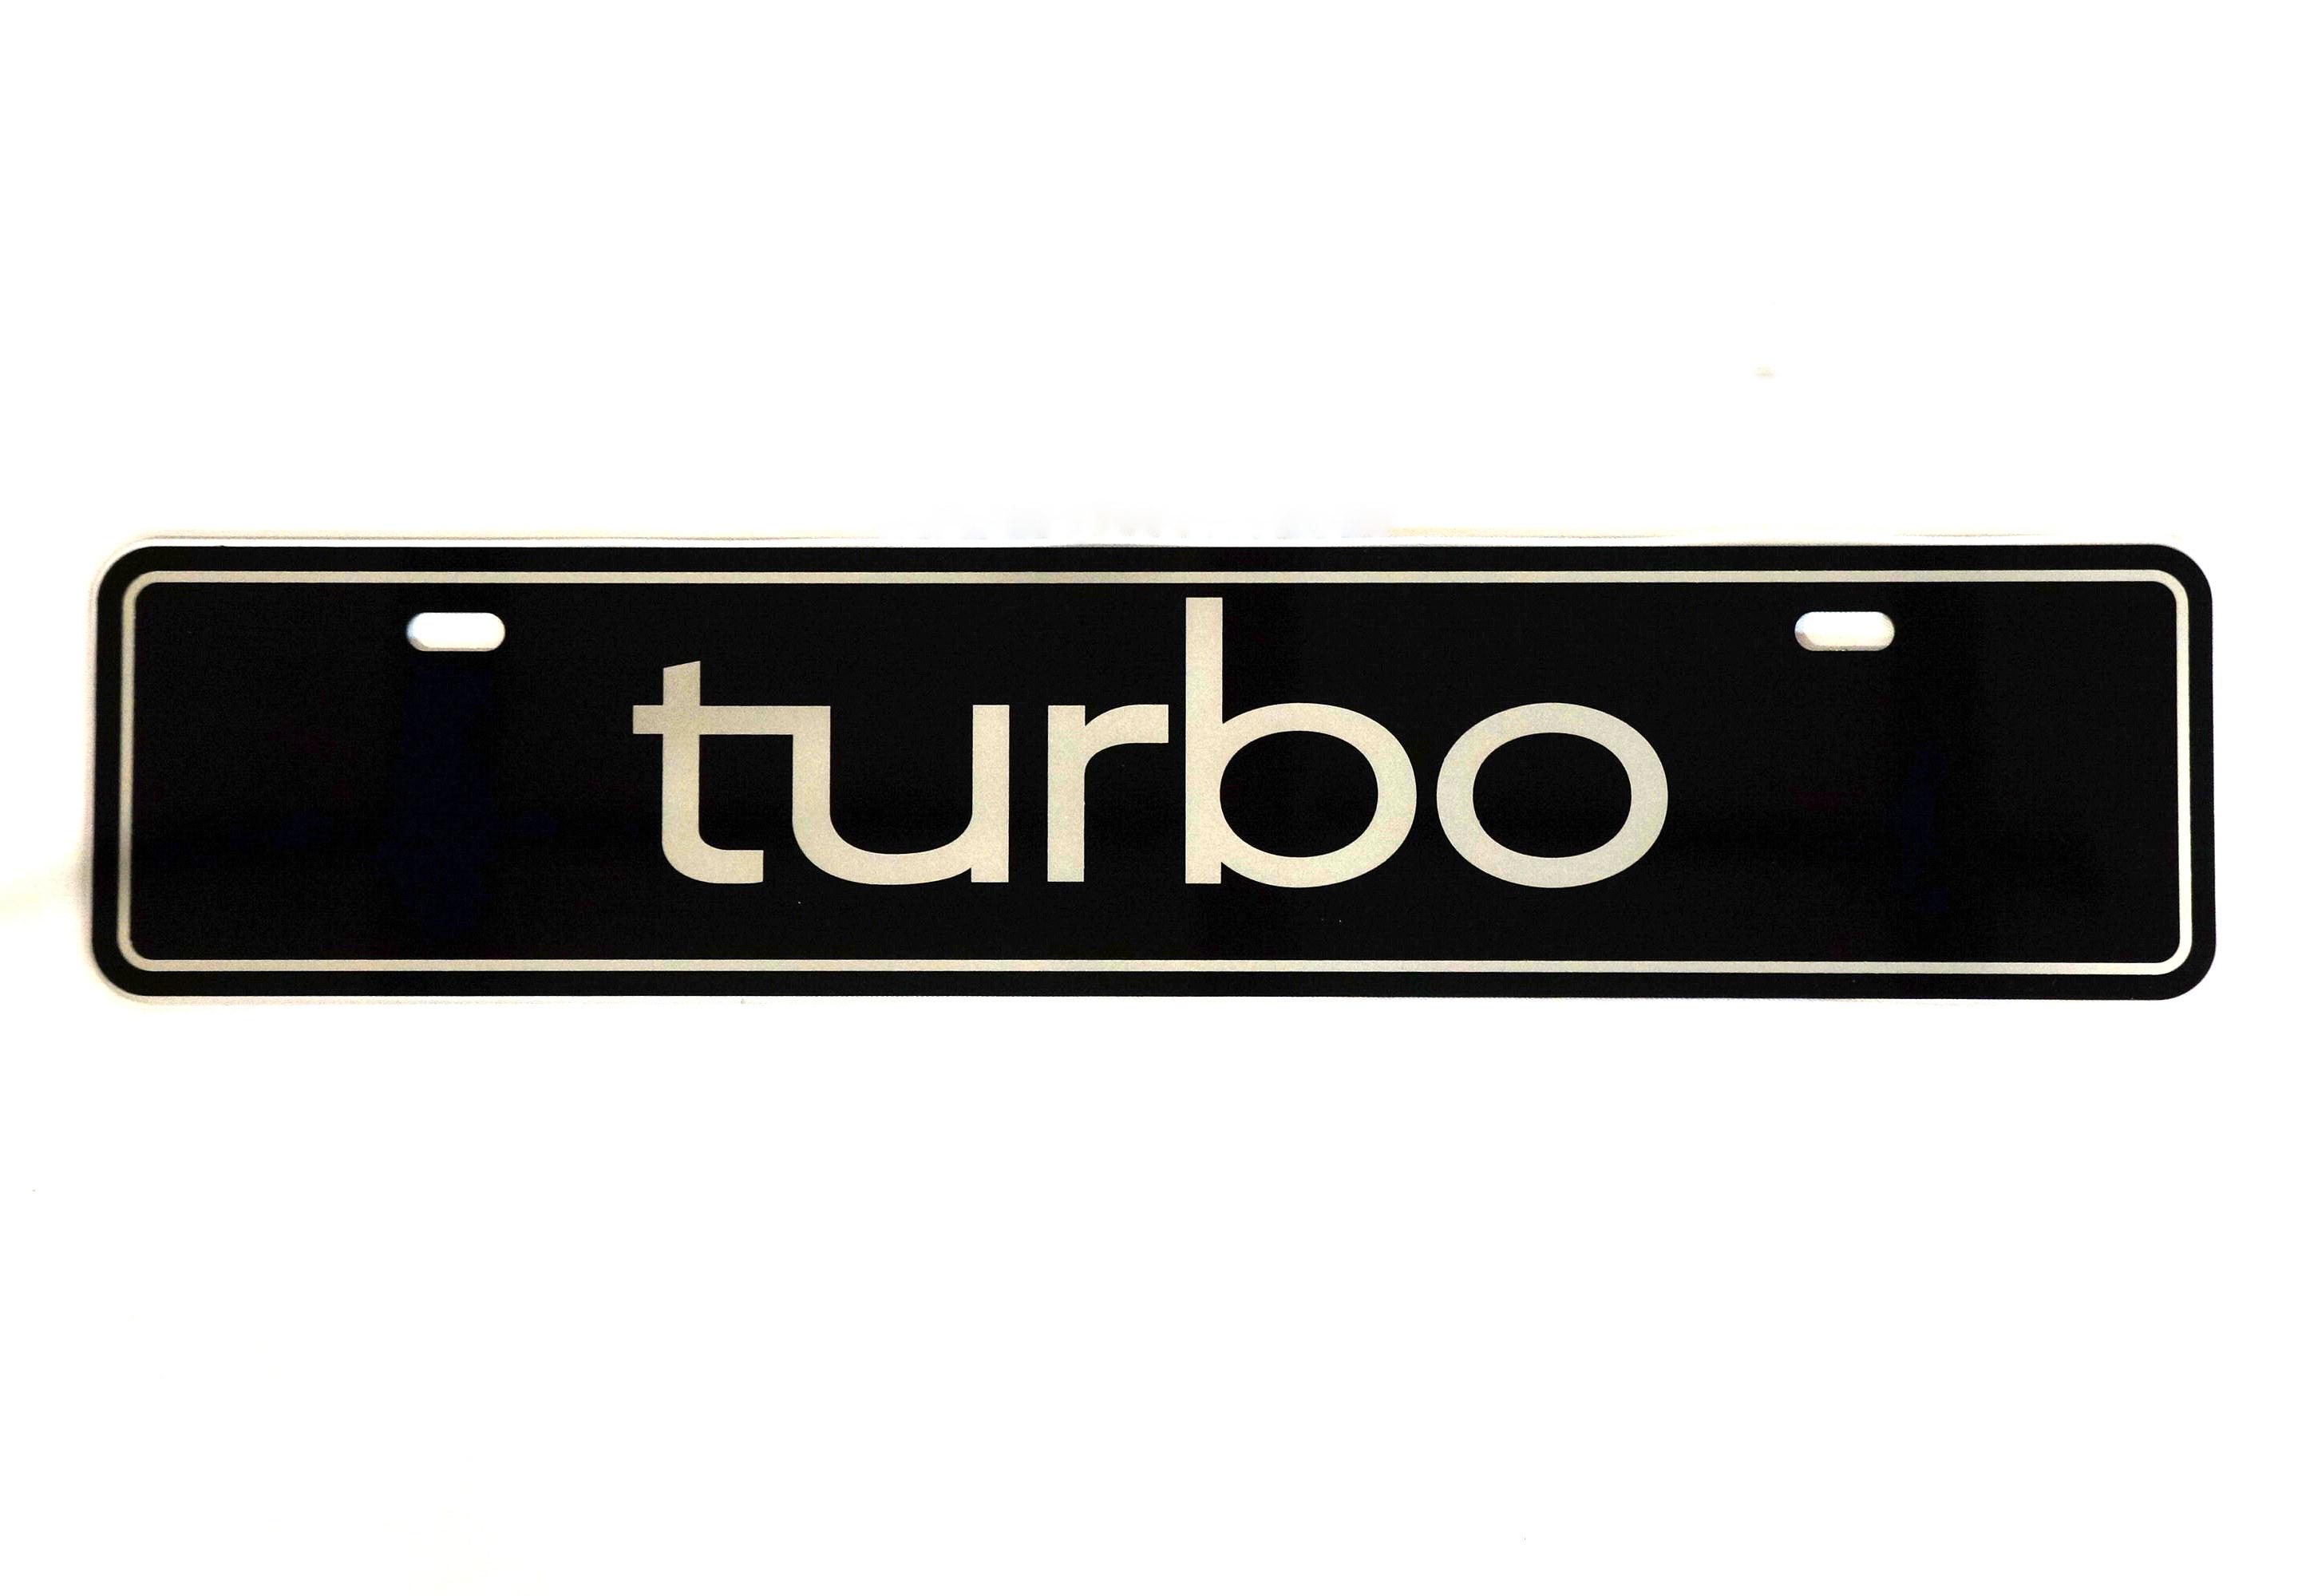 Euro Vanity Plate (turbo)